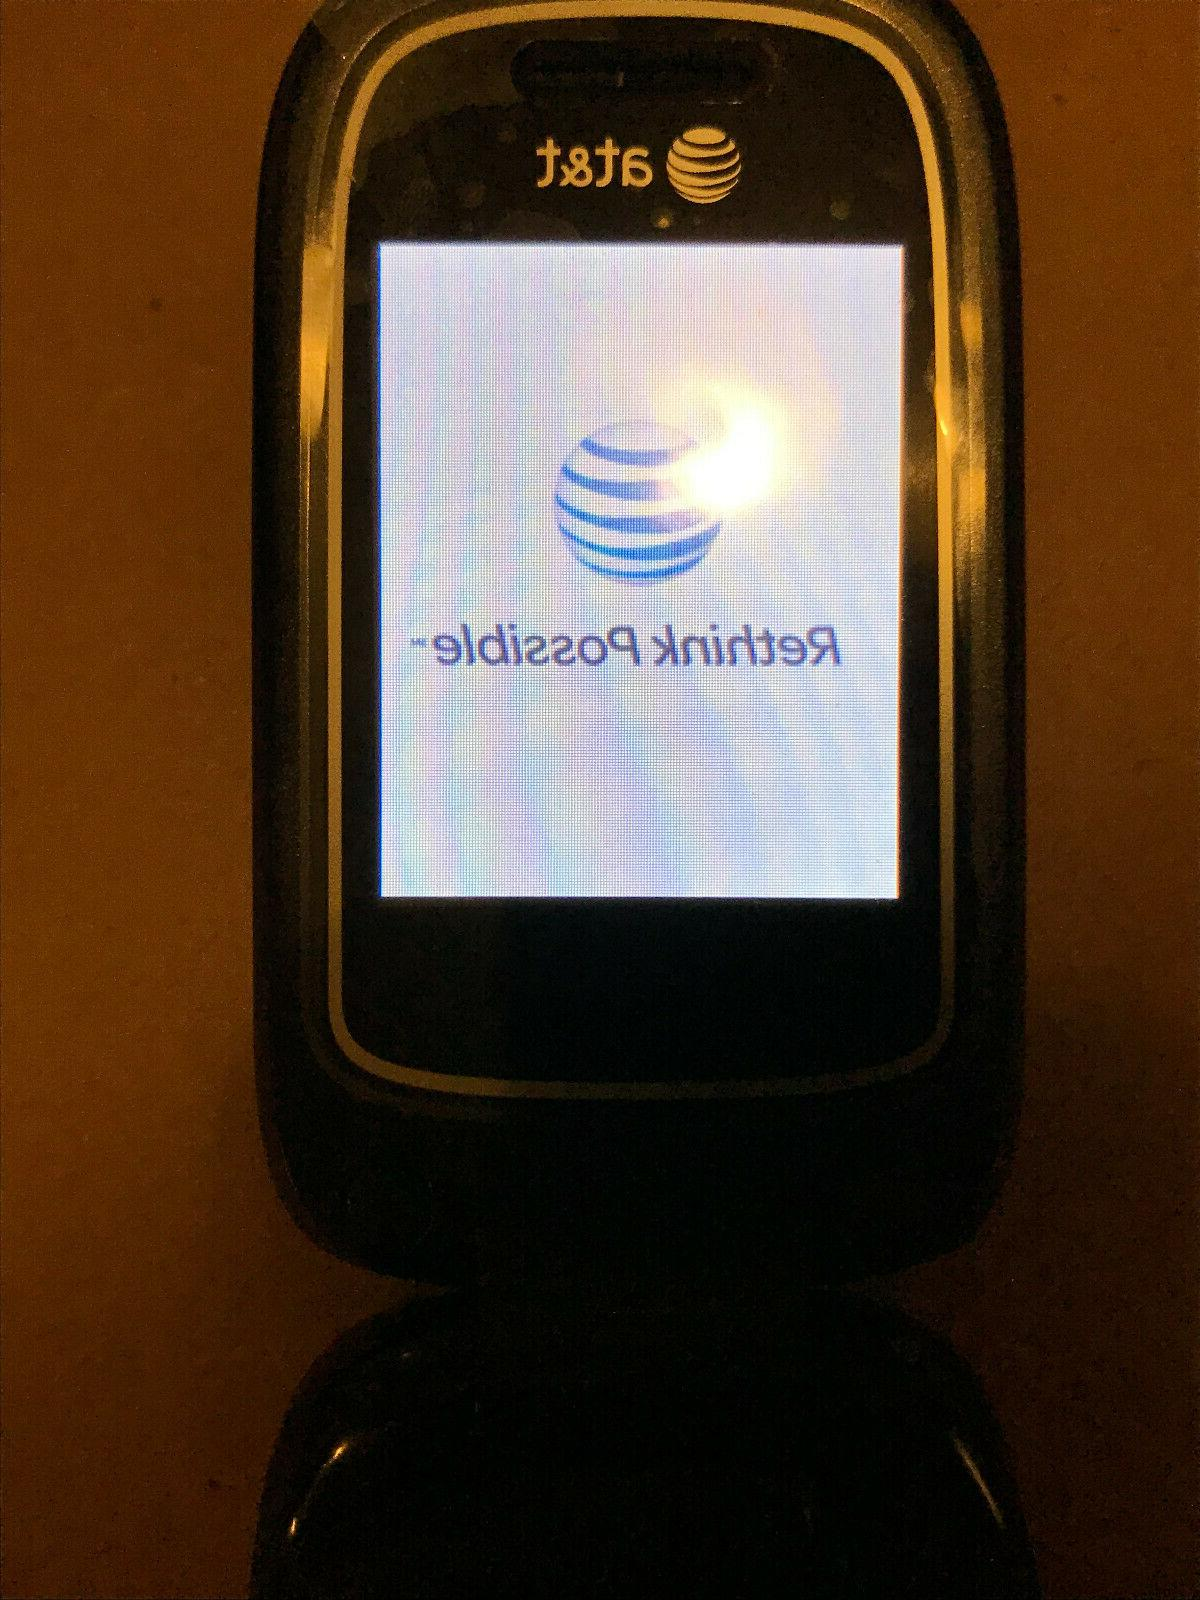 ZTE Z223 Flip Phone Brand New UNLOCKED For AT&T, T-Mobile, M